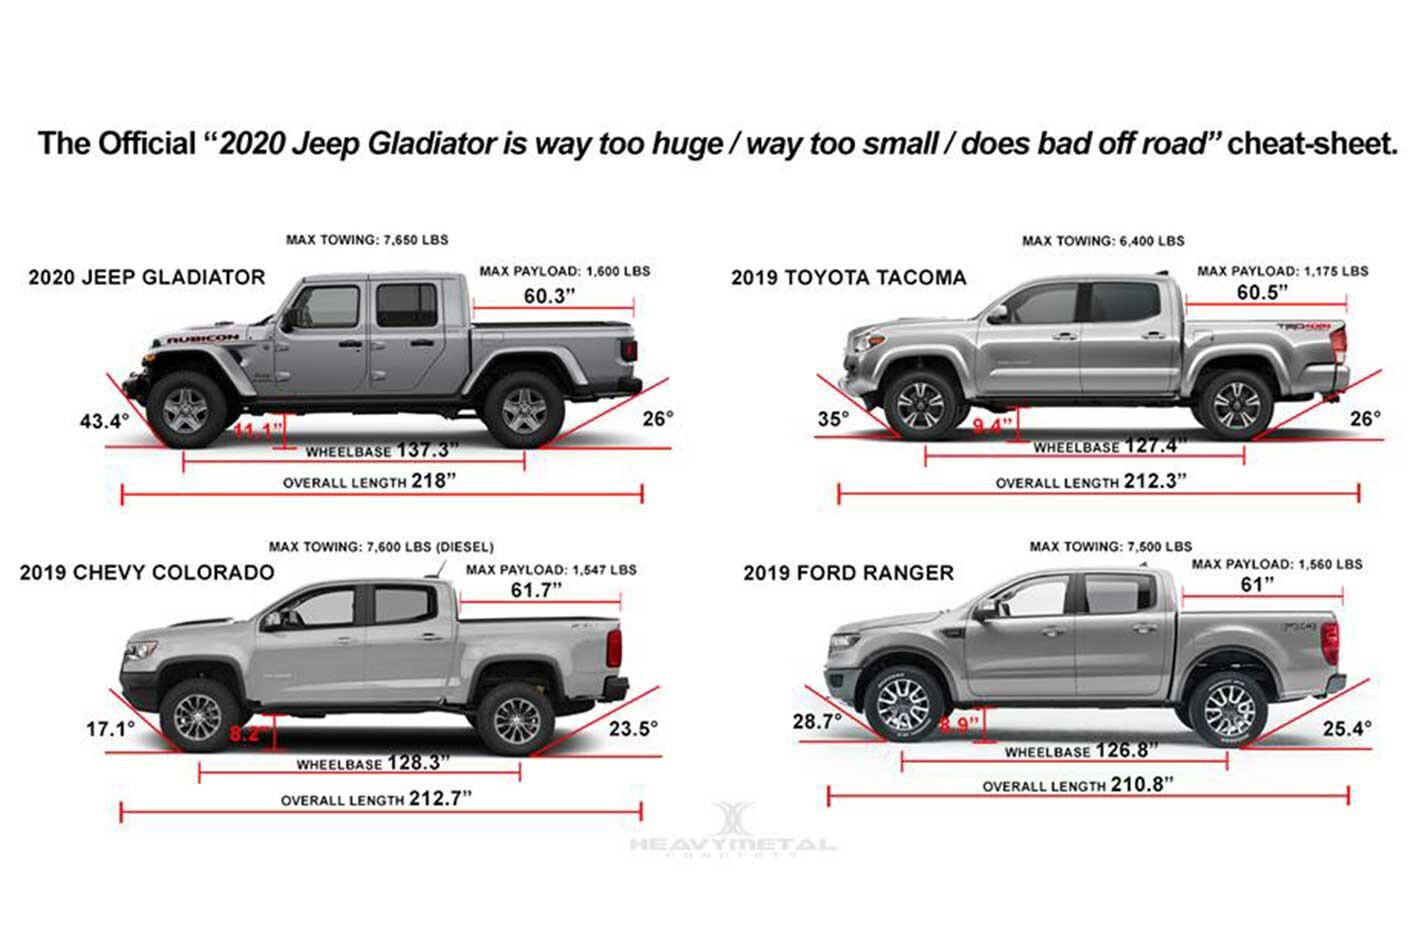 2020 Jeep Gladiator Size Comparison Chart Jpg